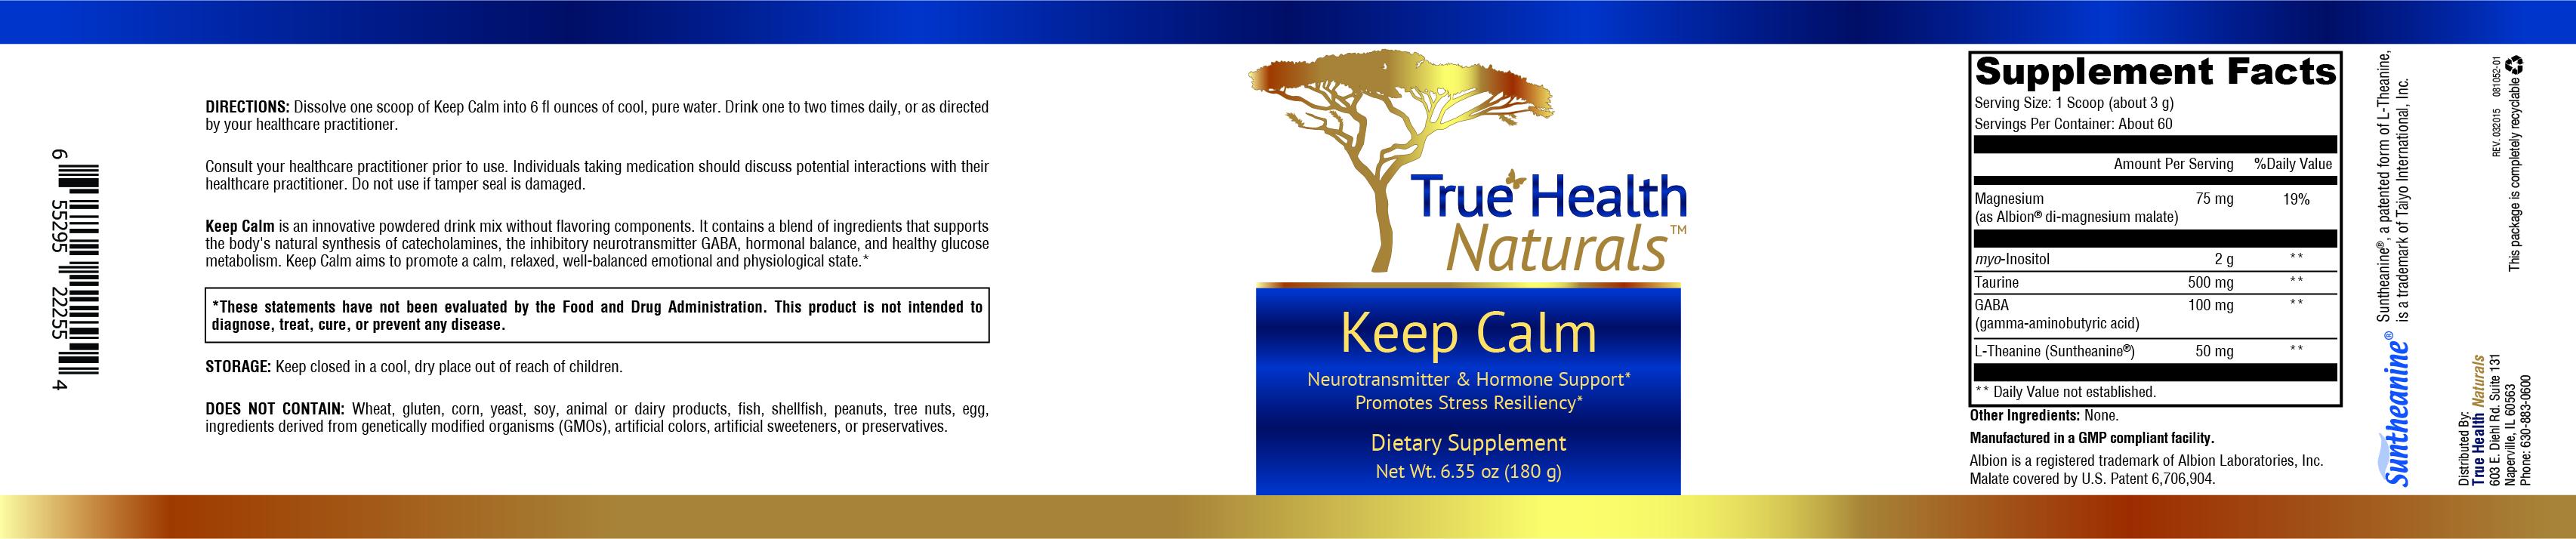 Keep Calm Dietary Supplement Label